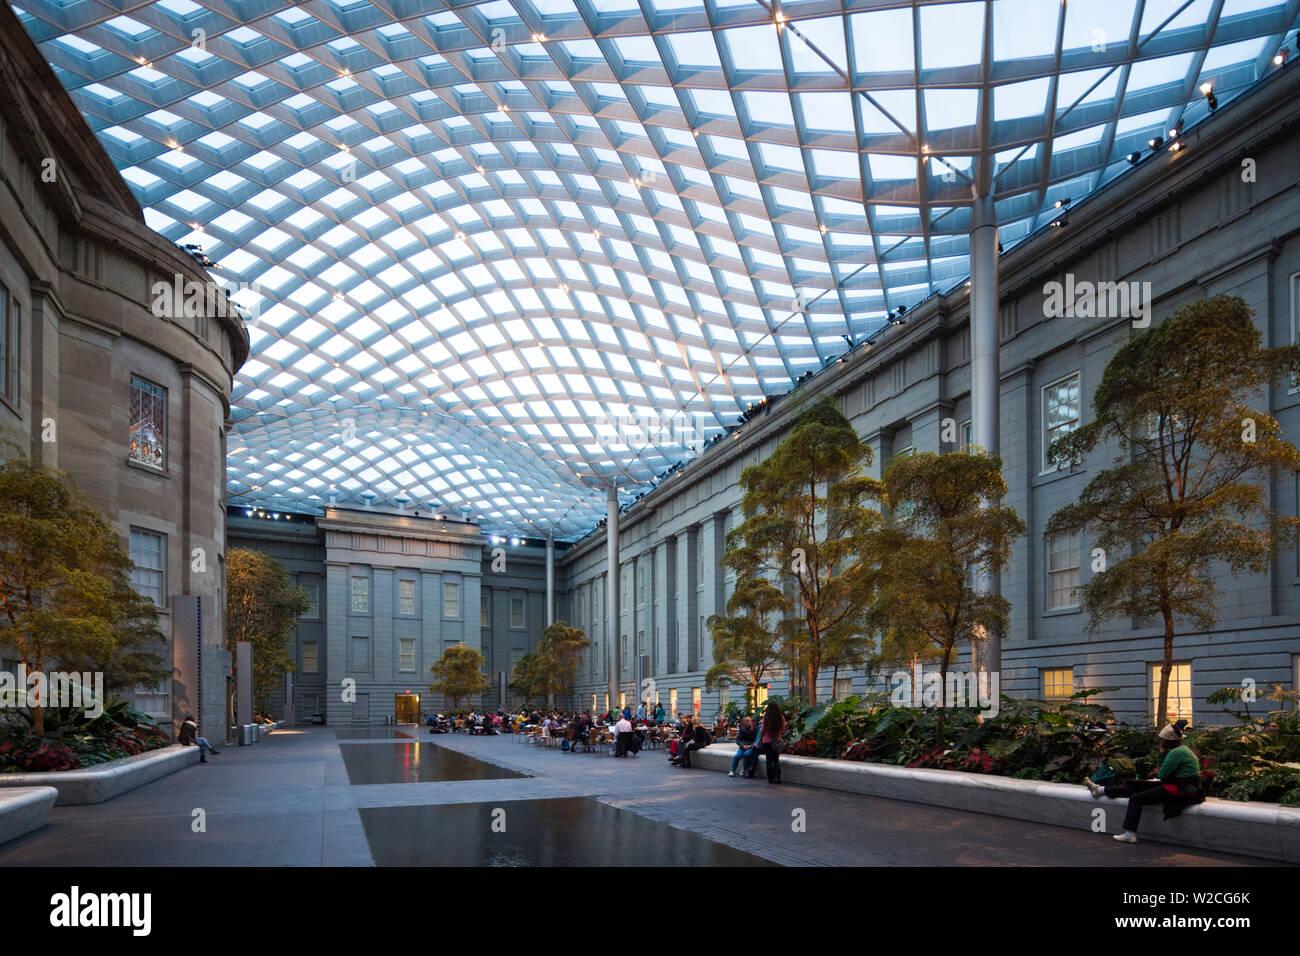 USA, Washington DC, Kogod Courtyard at the National Portrait Gallery Stock Photo